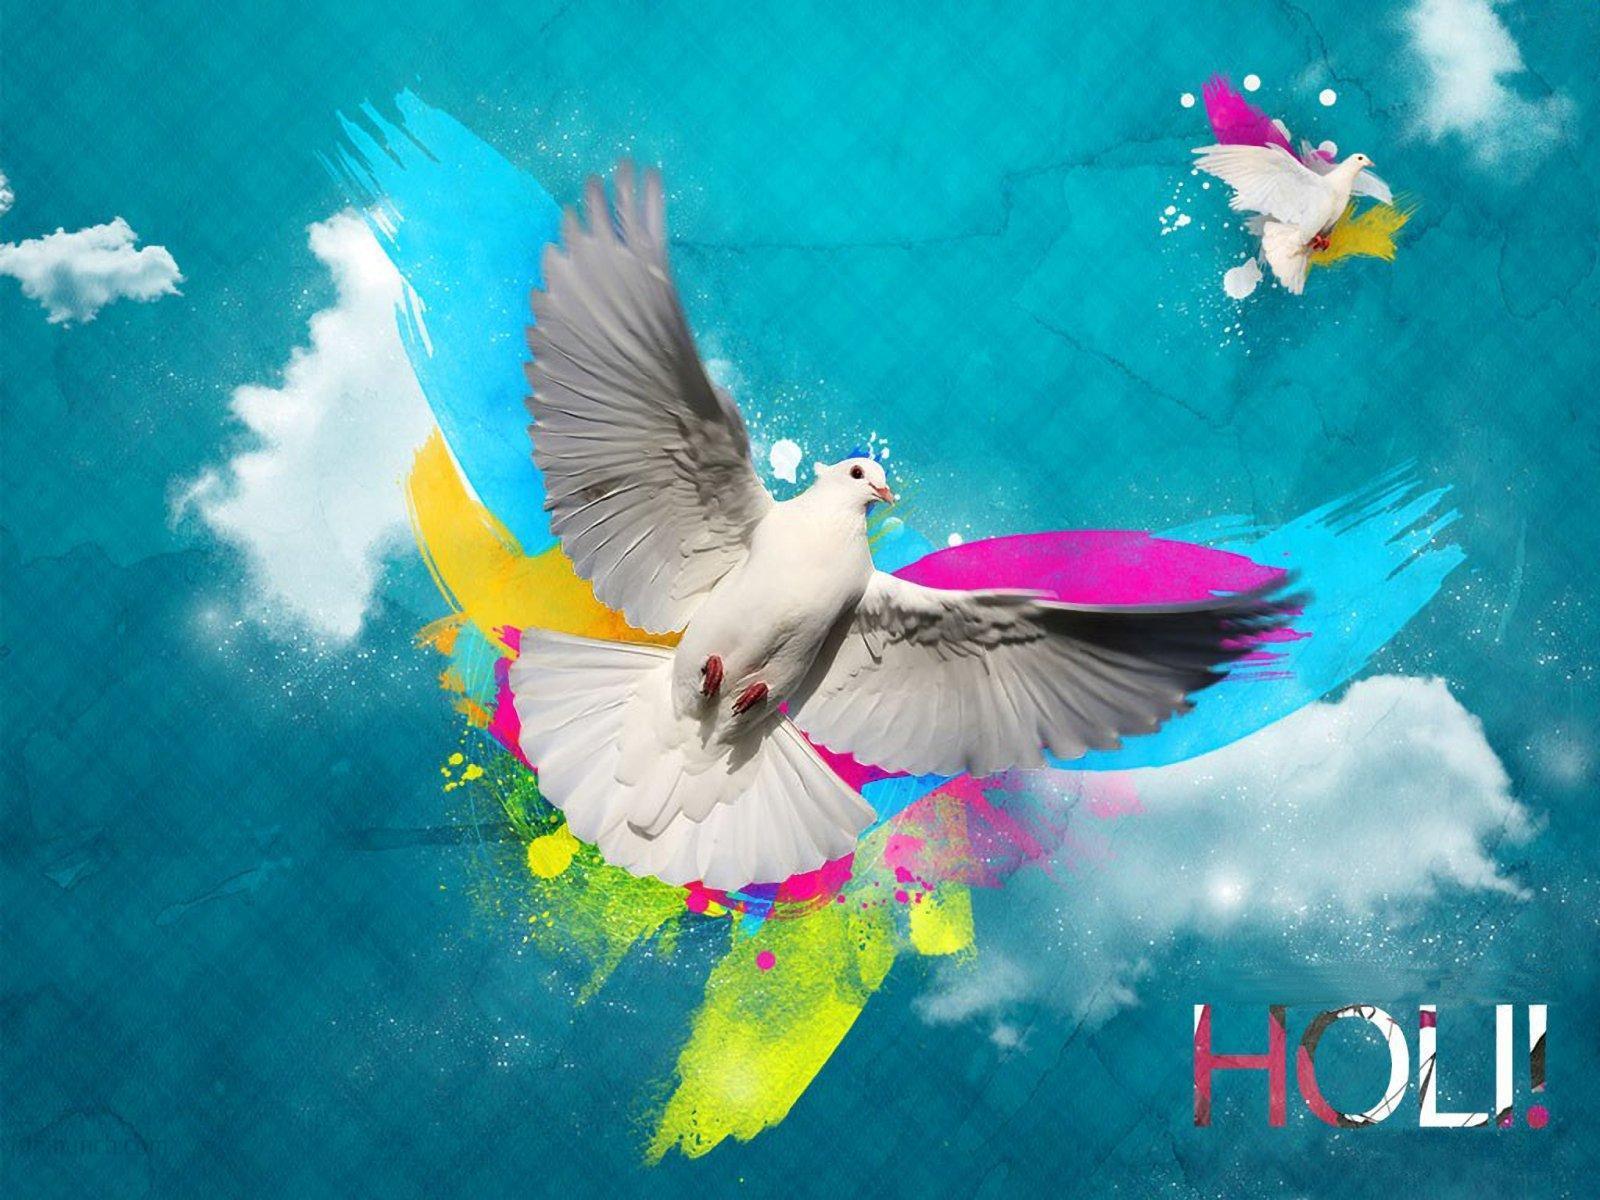 http://4.bp.blogspot.com/-TV0cK8IARRM/UUhs4YcT77I/AAAAAAAAATM/Z323HeGtKWk/s1600/wallpaper-for-happy-holi-wishes-with-dove-HD-desktop.jpeg